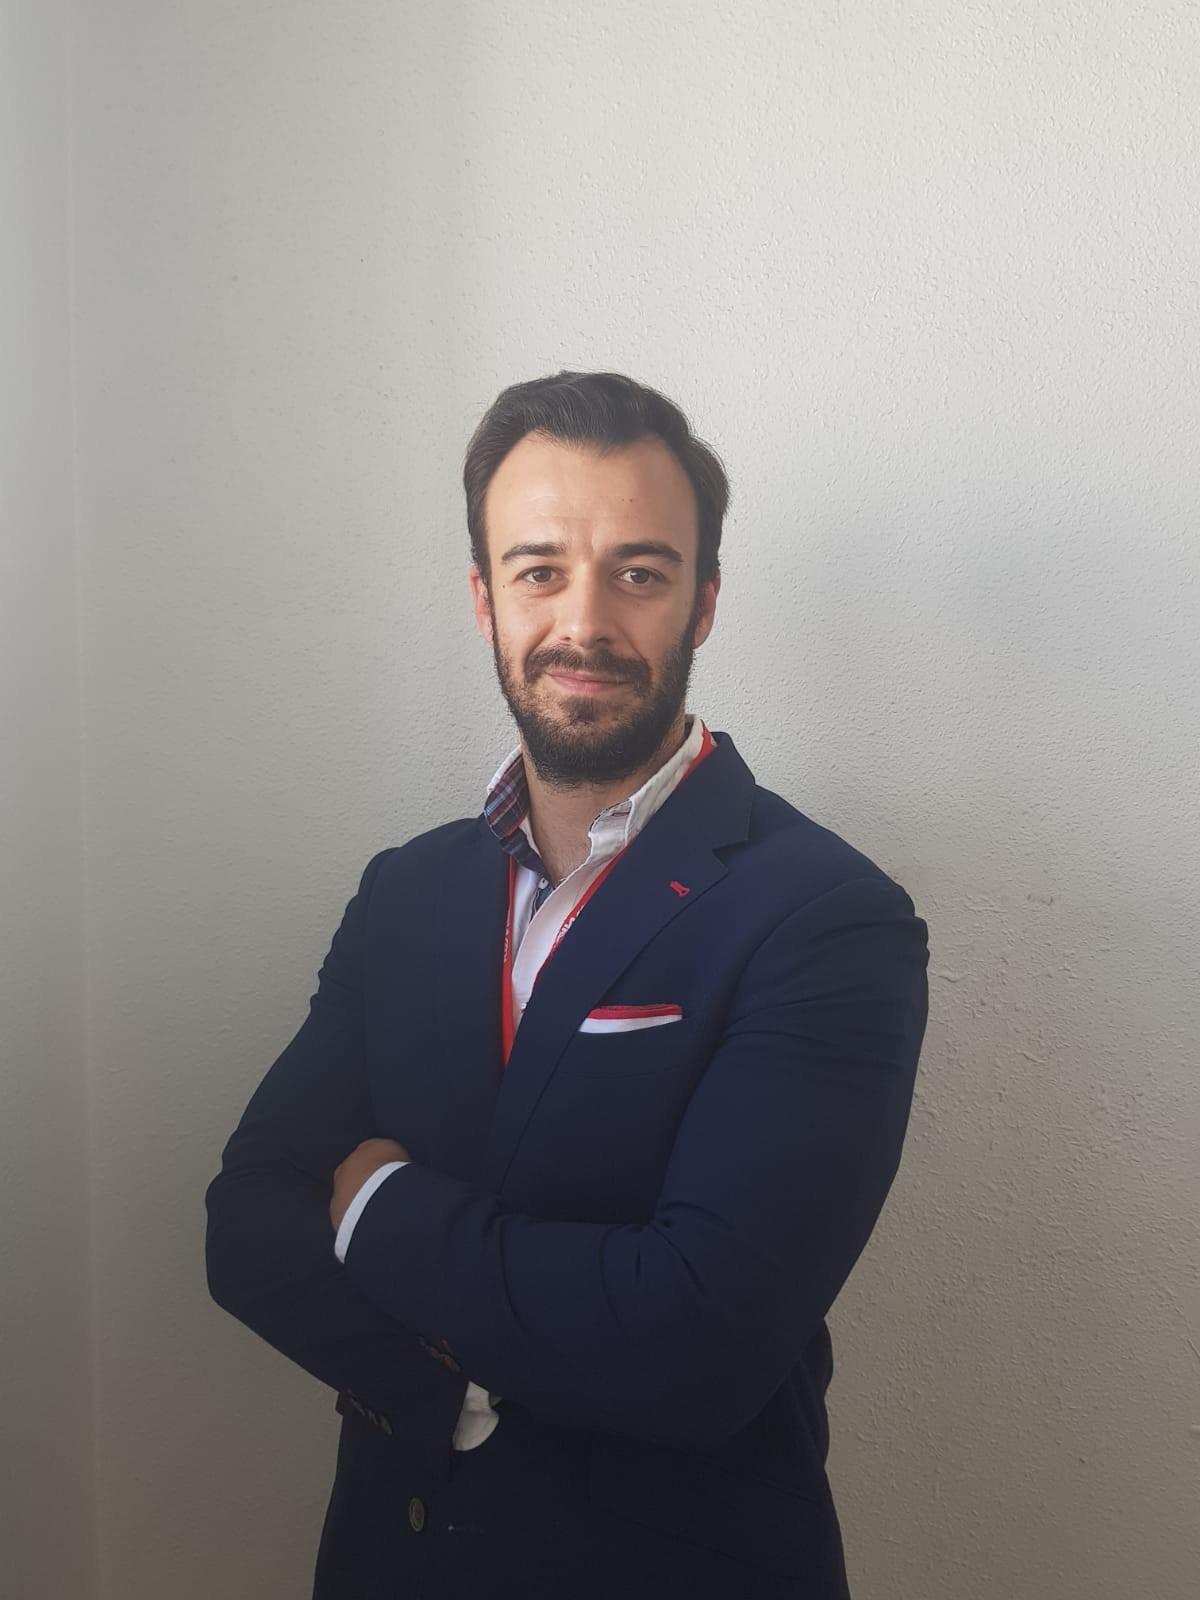 Antonio Candil Centeno